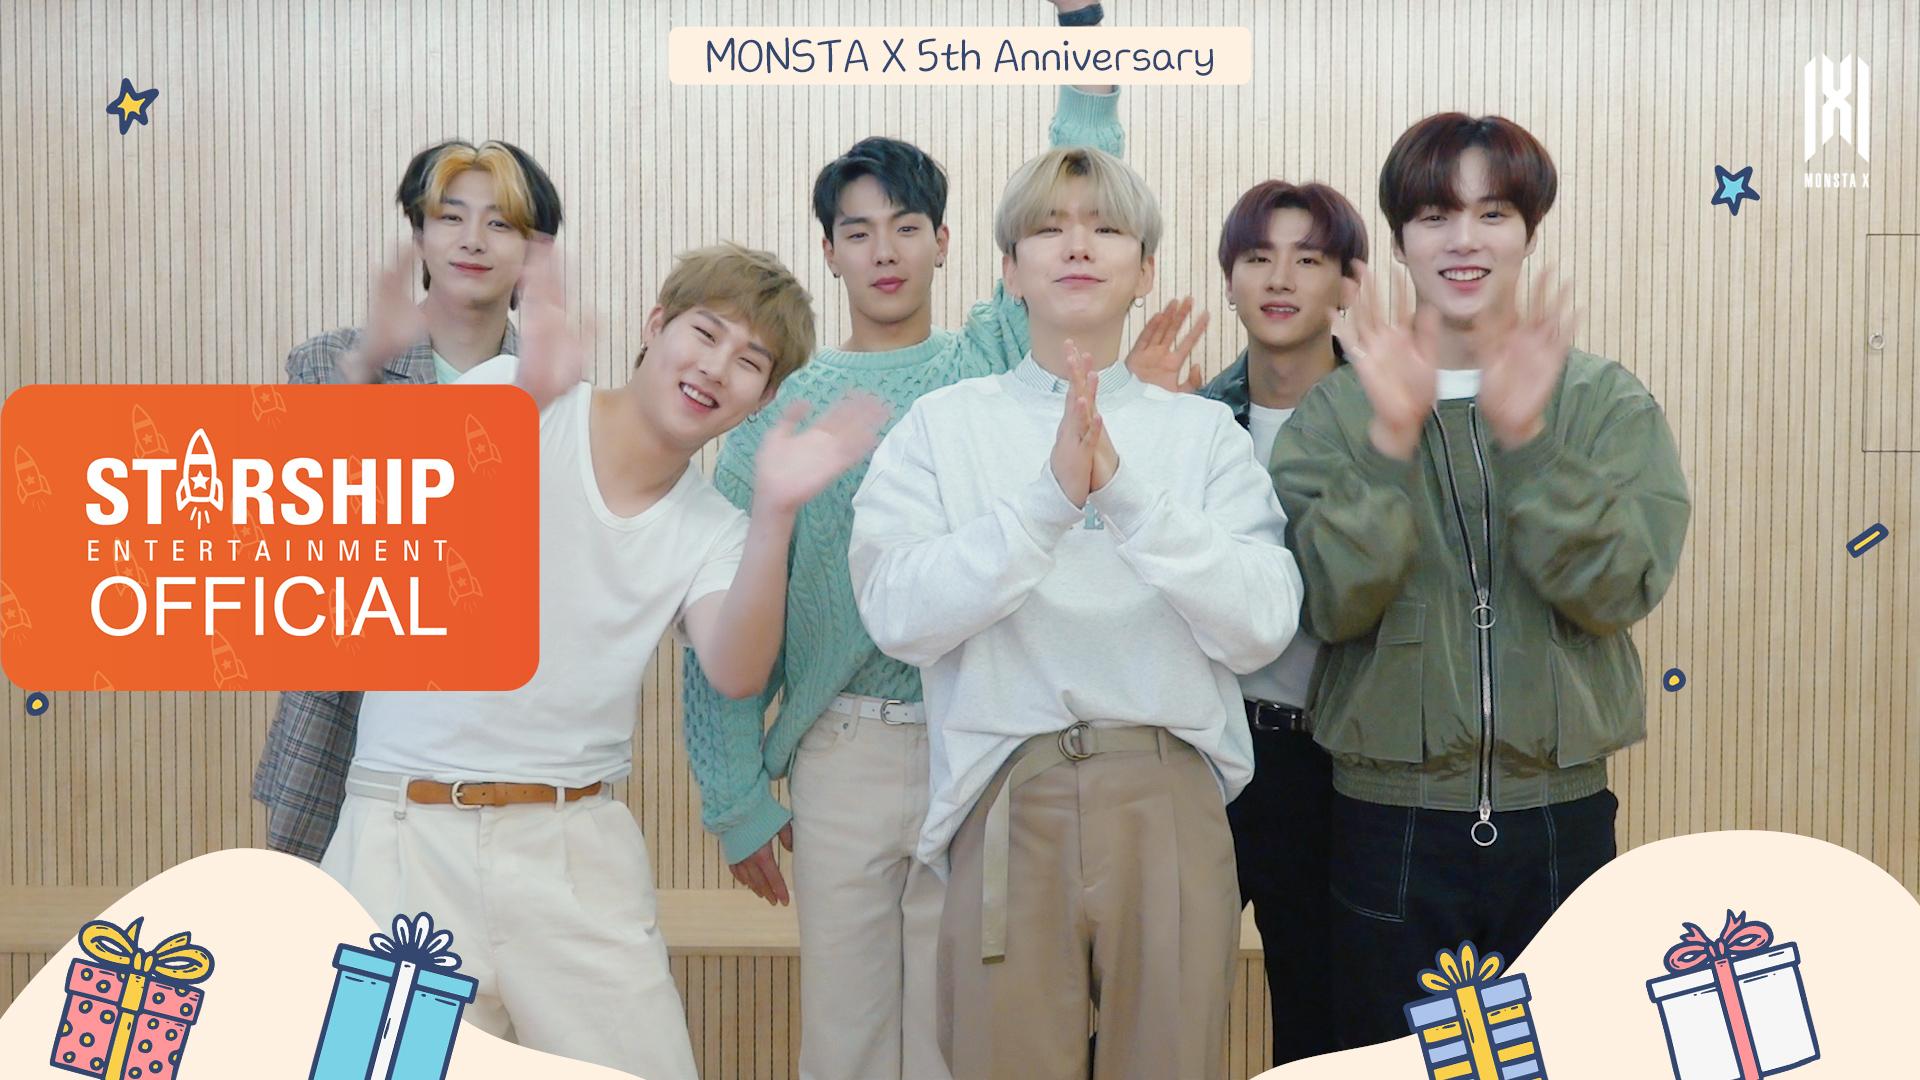 [Special Clip] 몬스타엑스 (MONSTA X) - DEBUT 5th Anniversary Message